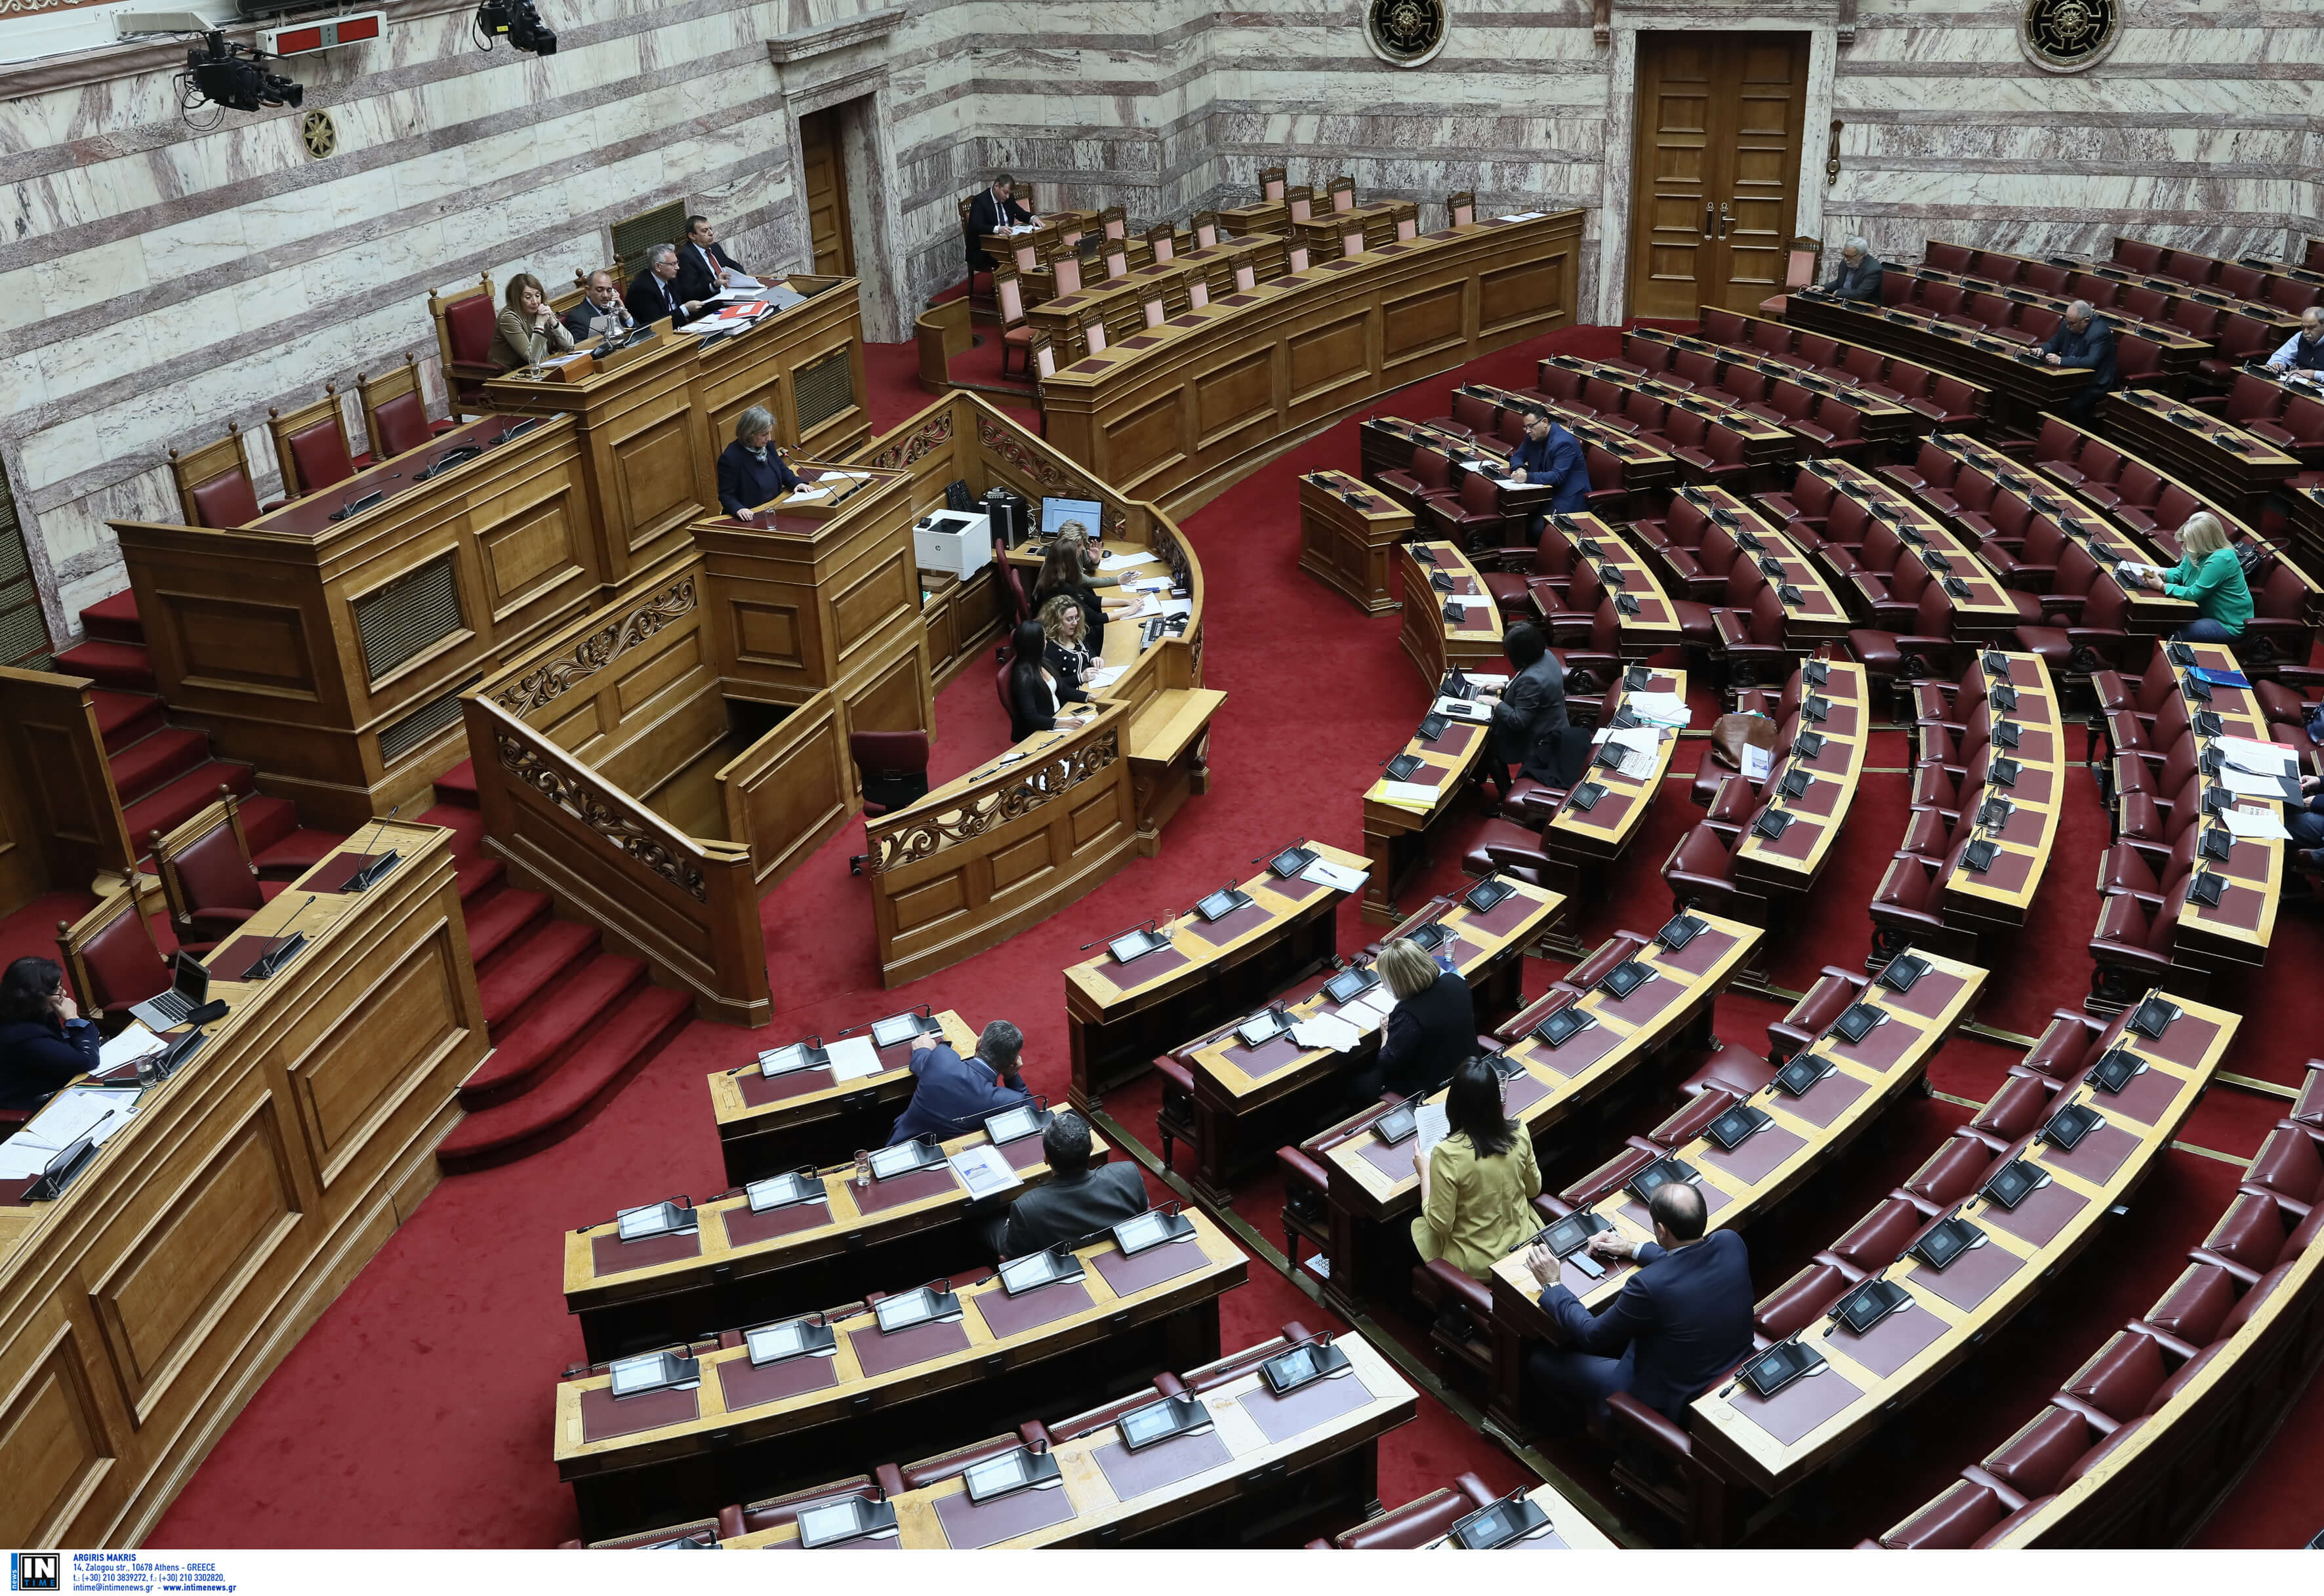 Live: Οι ομιλίες των πολιτικών αρχηγών στην Βουλή για το δημογραφικό